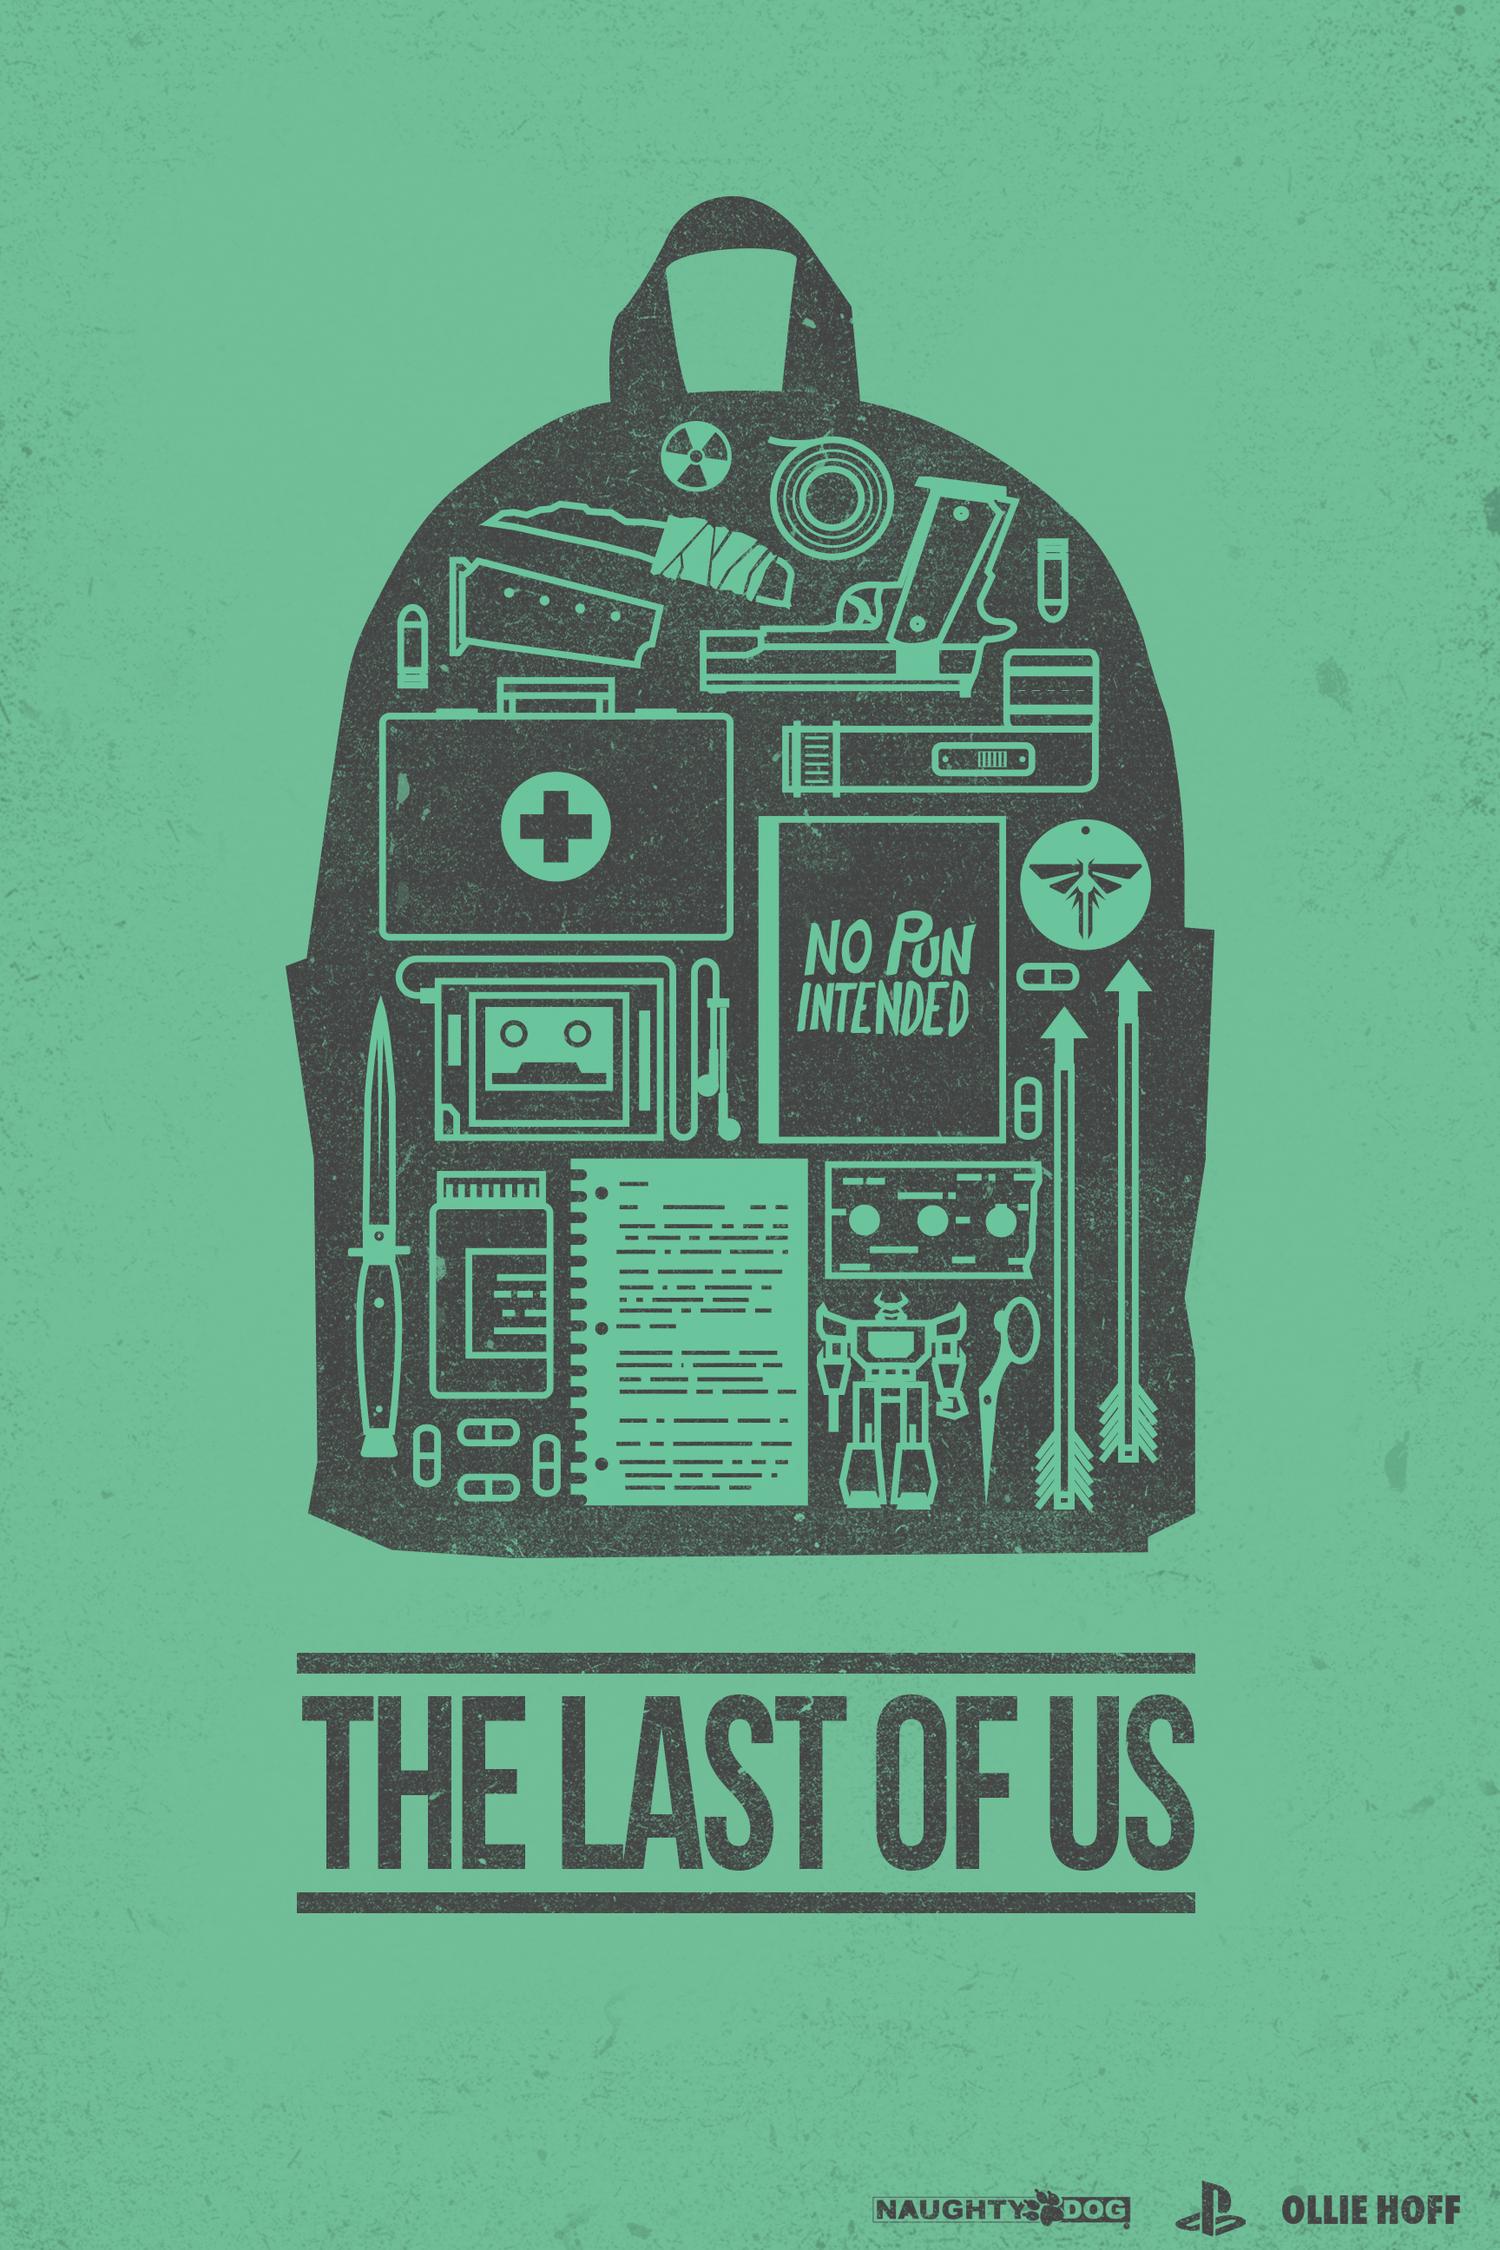 TLOU_Poster